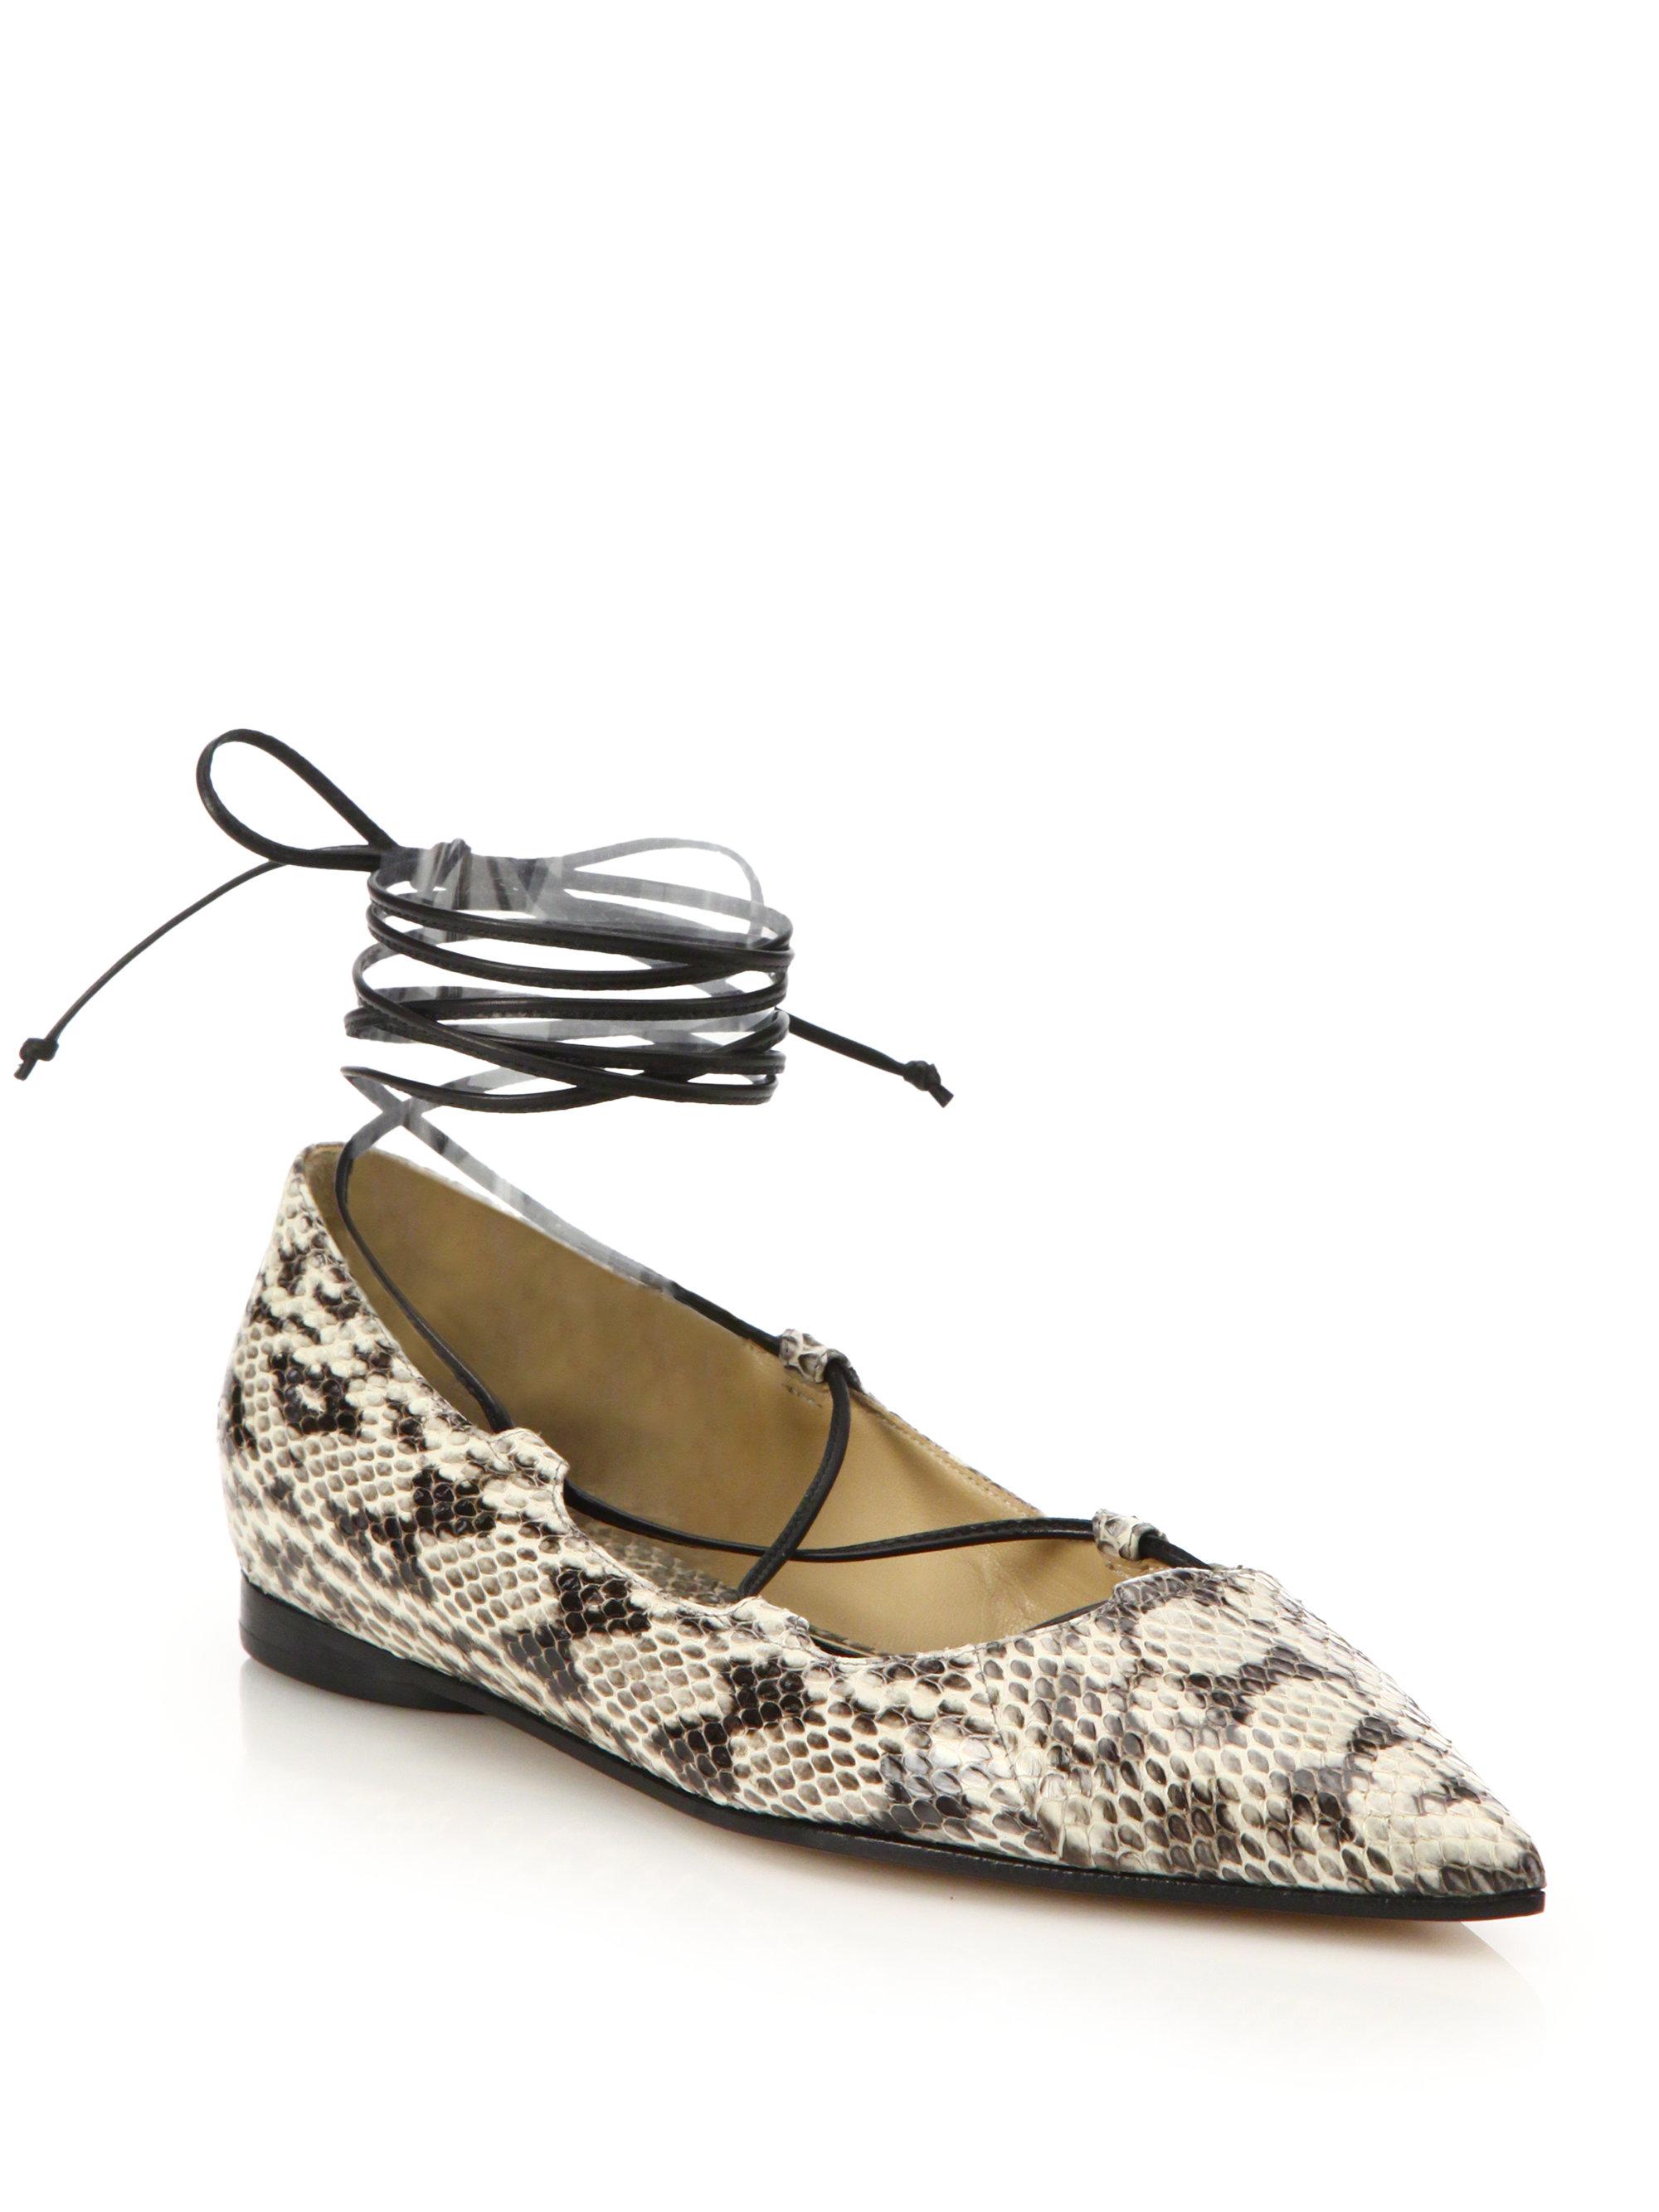 Lyst Michael Kors Kallie Snakeskin Amp Leather Ankle Wrap